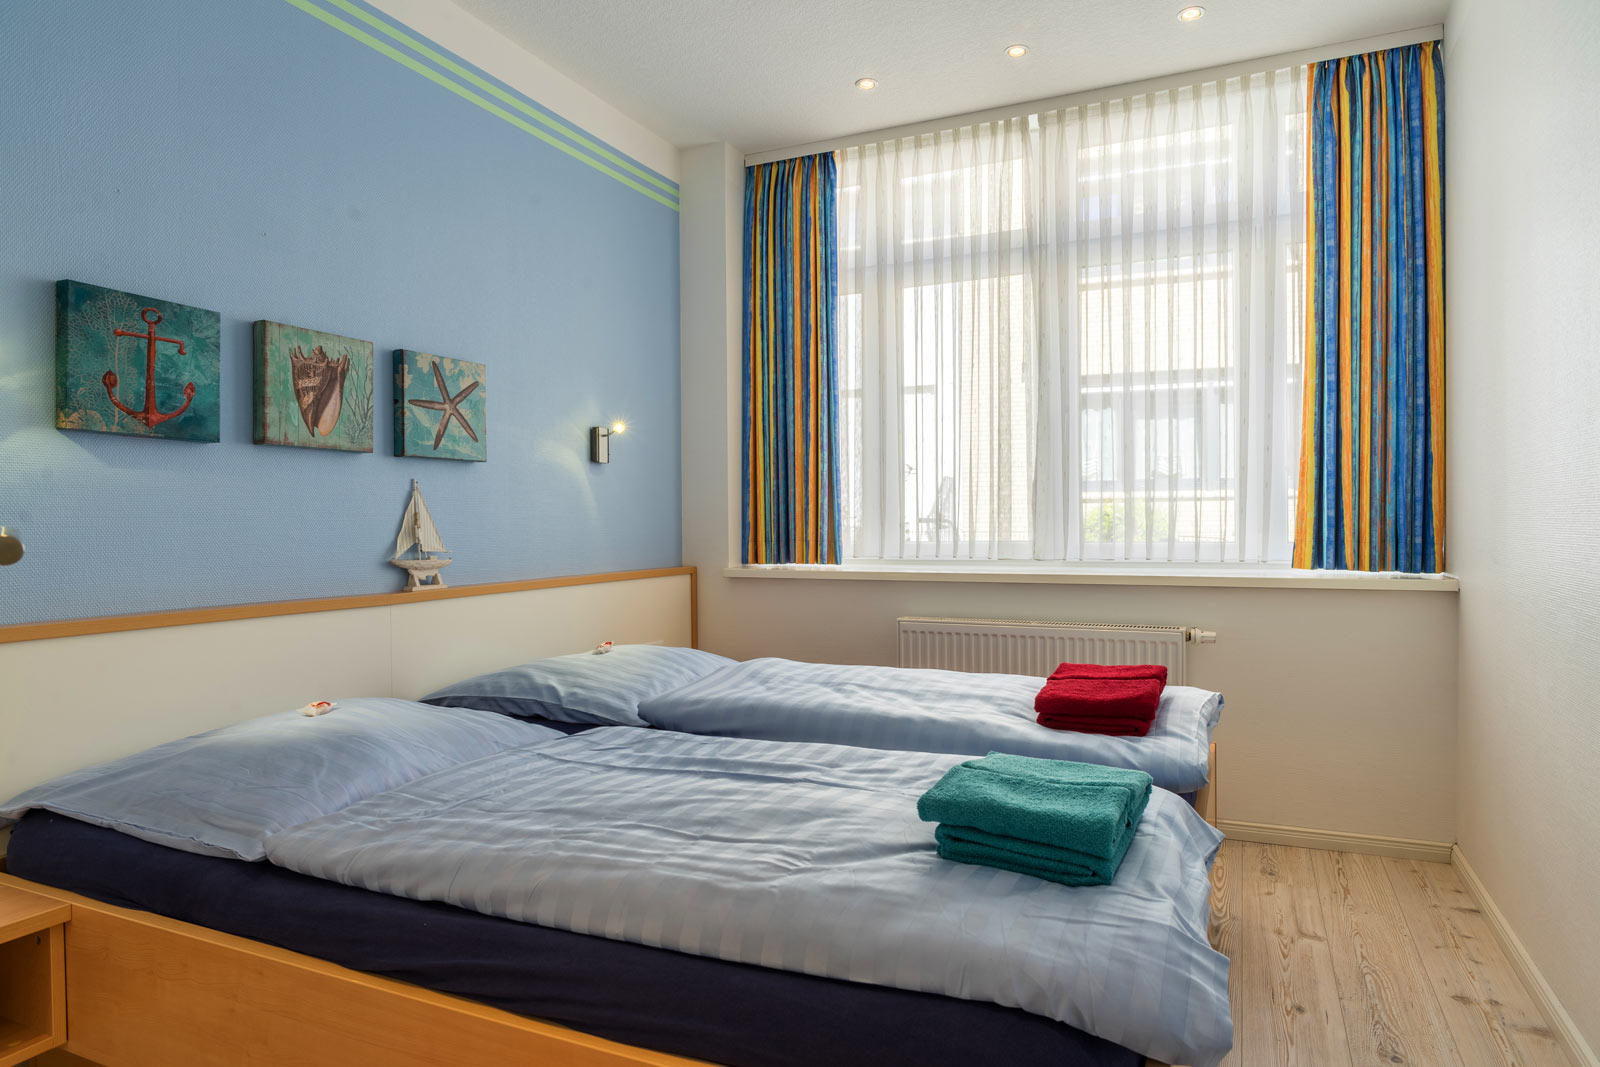 2-Bett-Schlafzimmer Apartment Sonnendeck